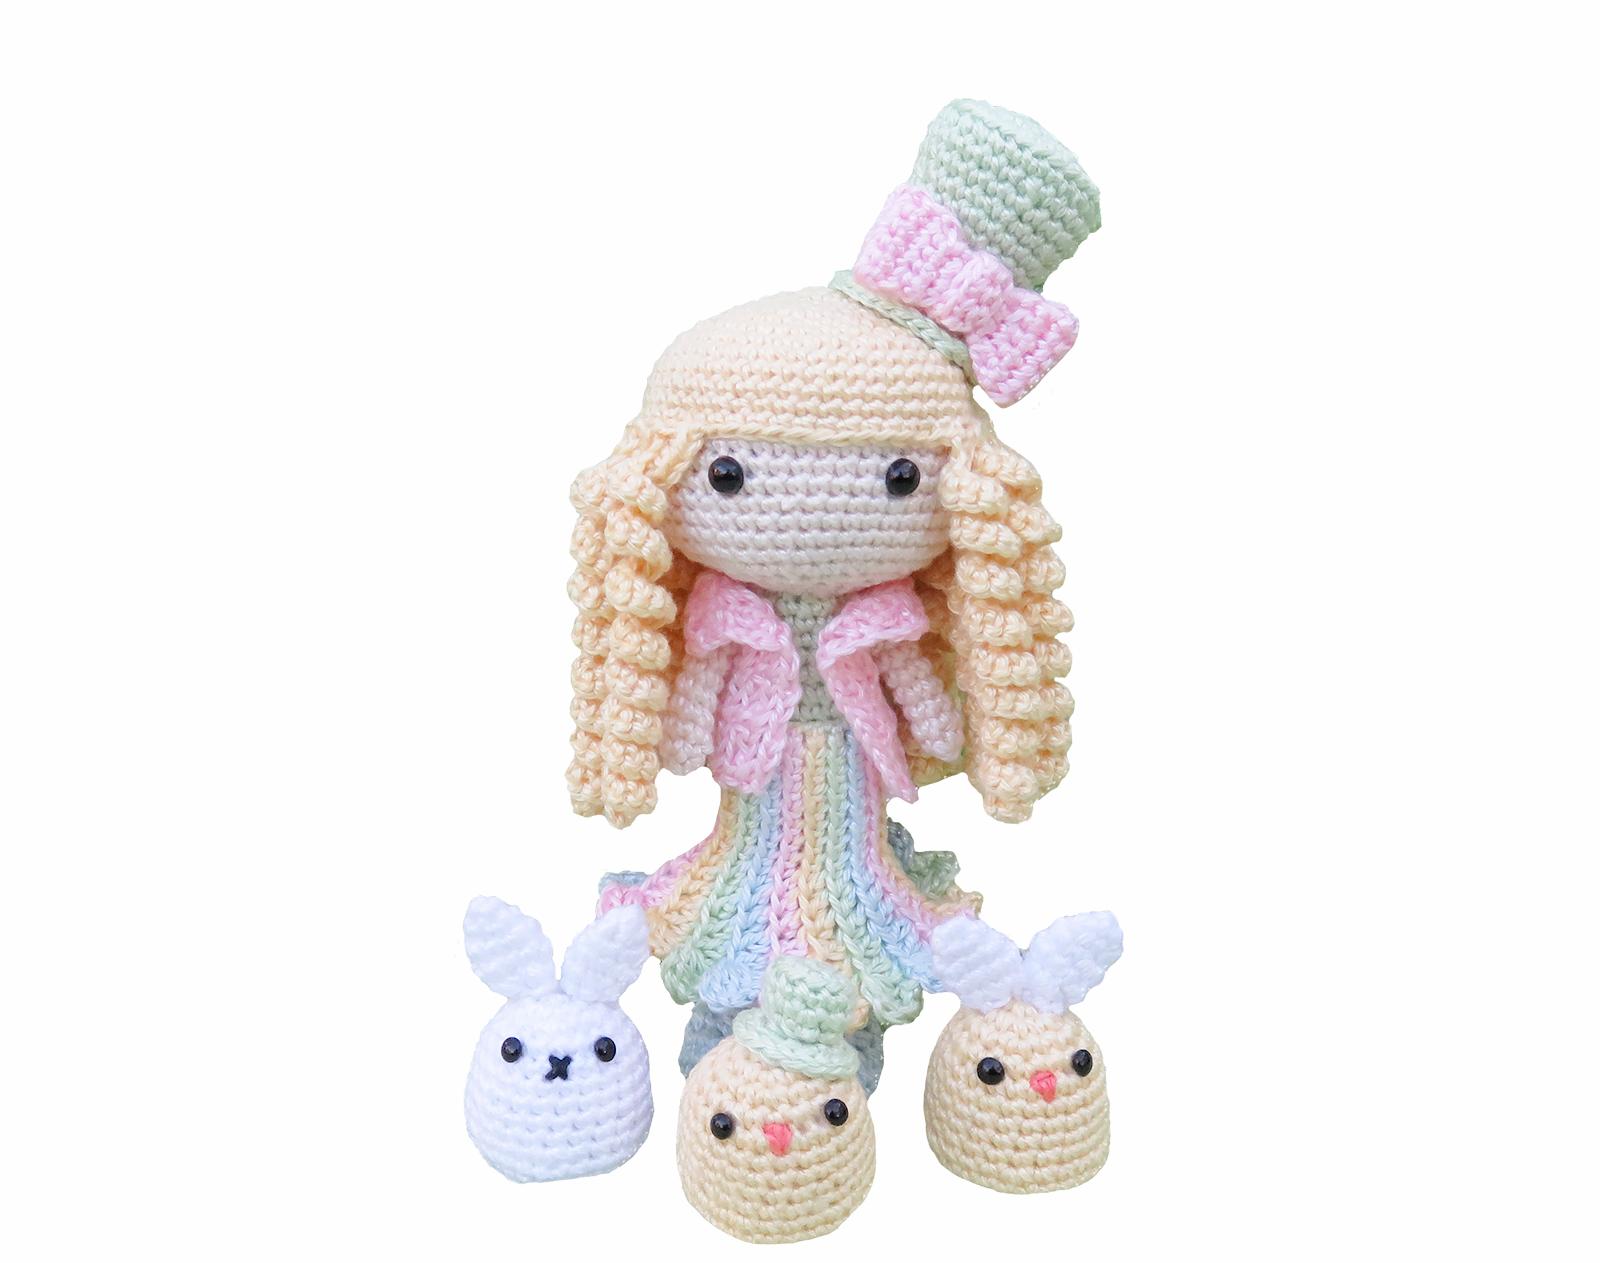 Frühlings-Puppe Amigurumi Häkelanleitung - Amigurumi ...